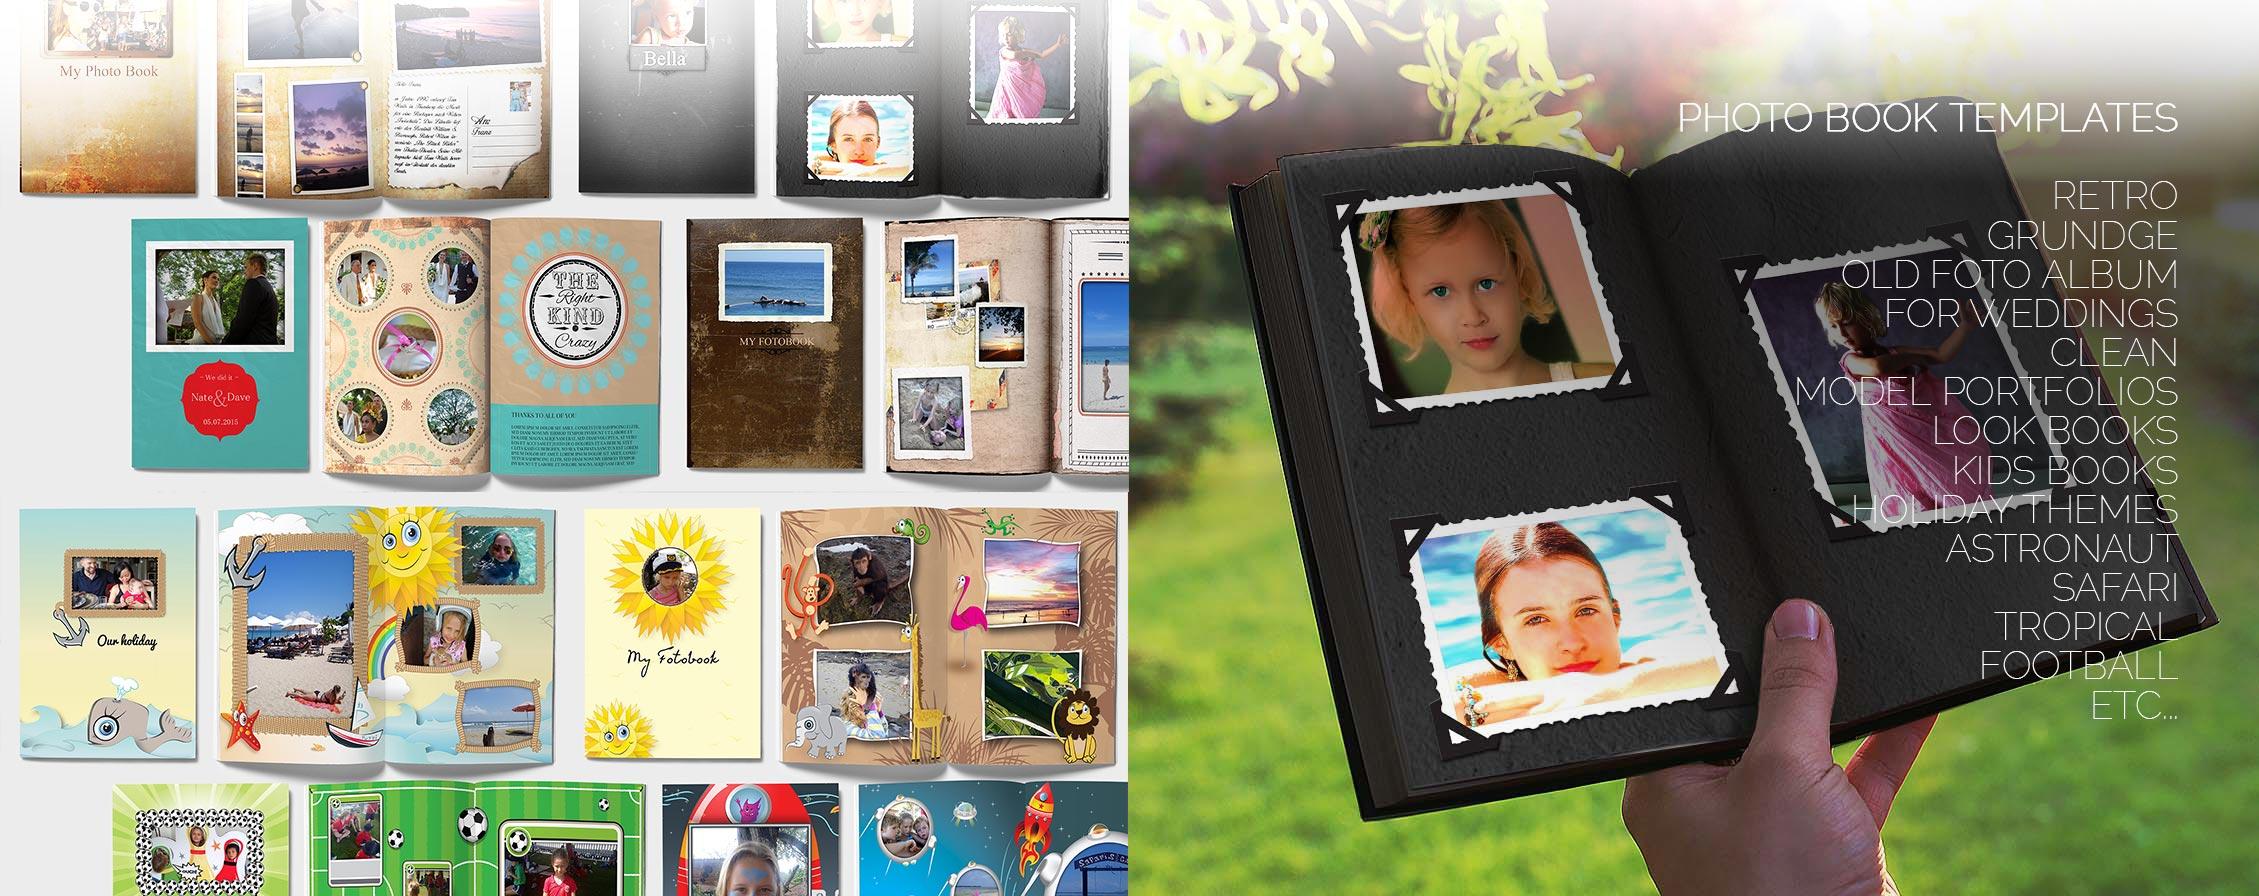 webtoprint fotobuch agentur templates muenchen agentur v3